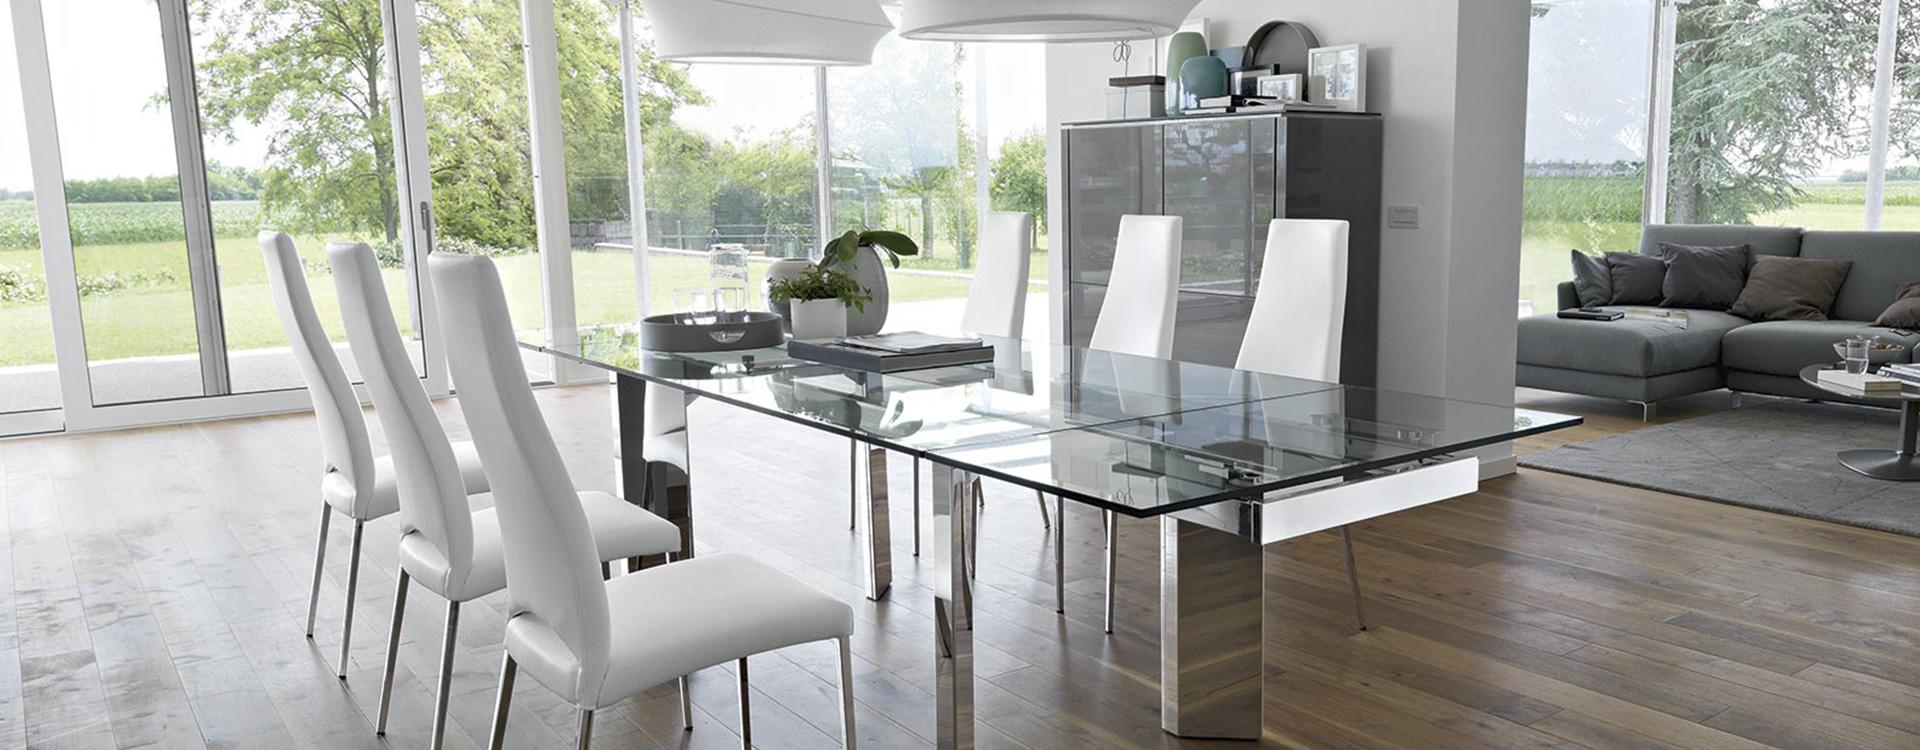 Slider-tavoli-sedie-1 - Centomo arredamenti